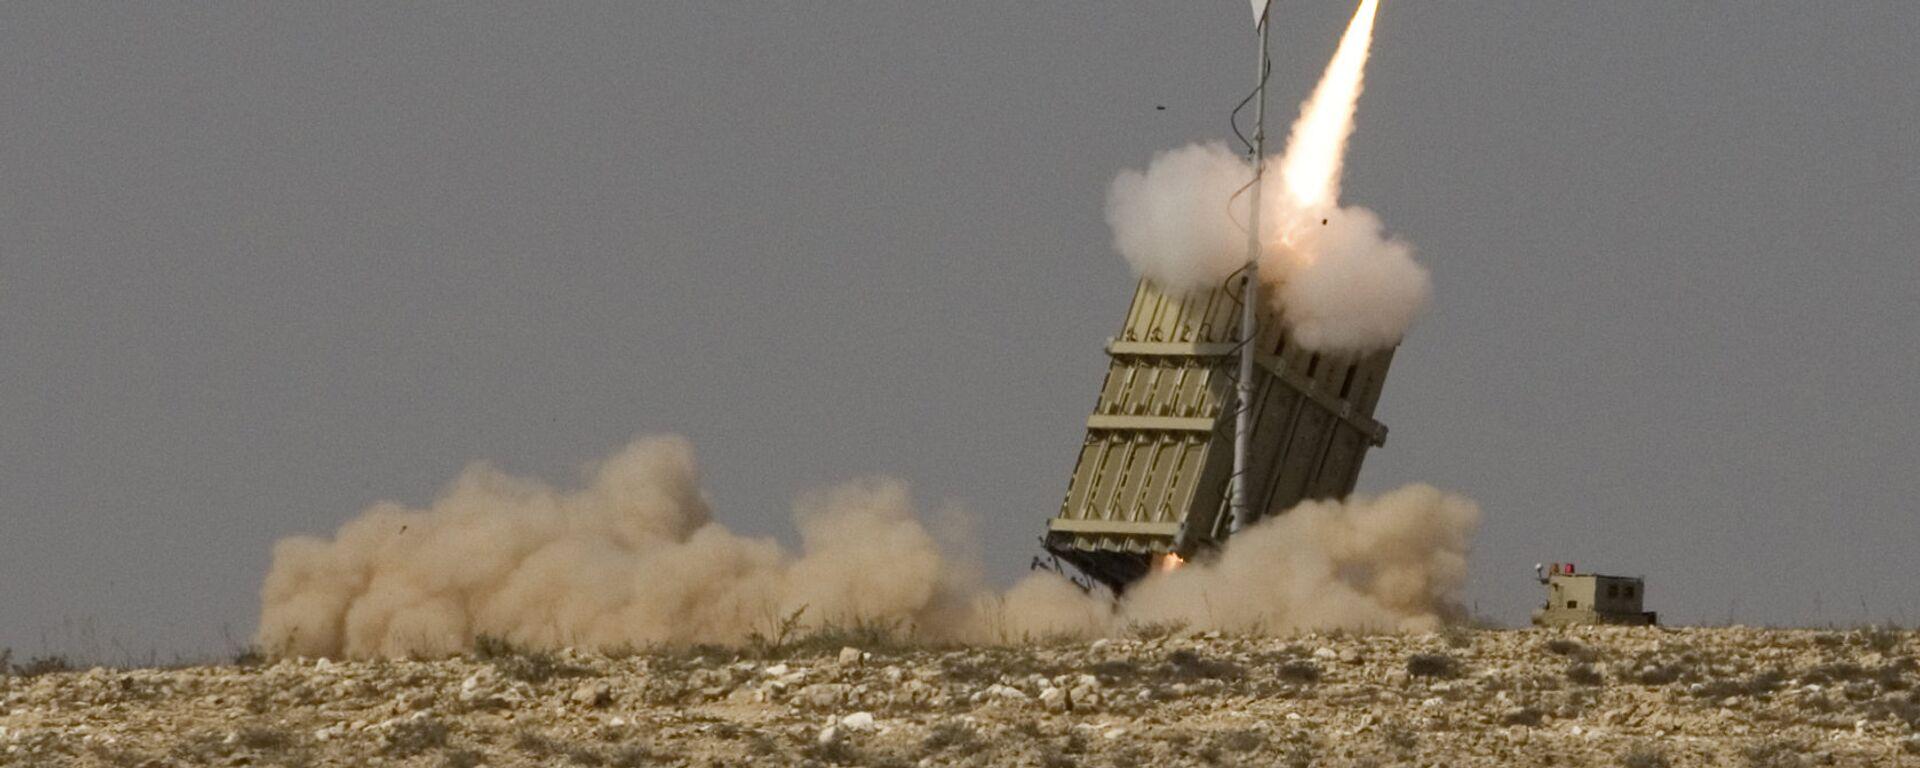 El sistema de defensa antimisiles israelí Cúpula de Hierro - Sputnik Mundo, 1920, 28.06.2021